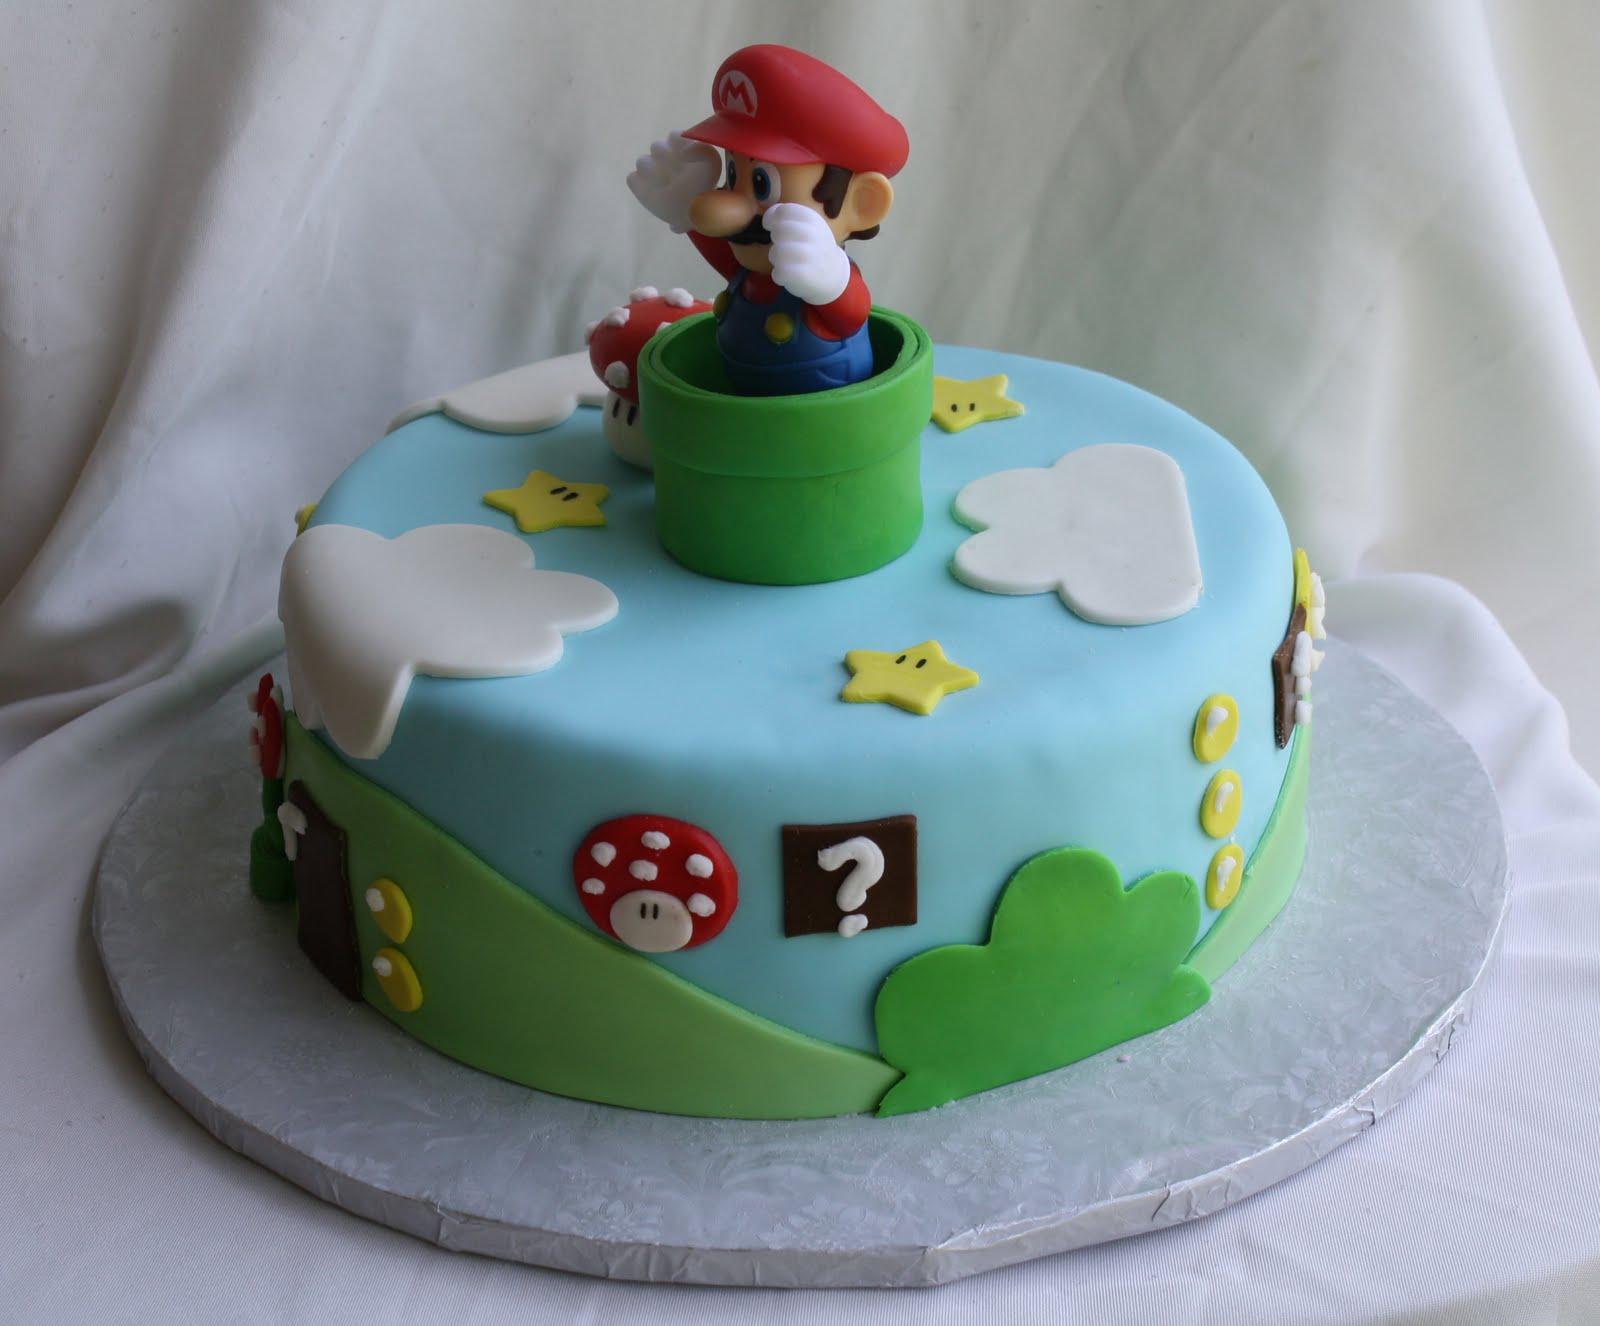 Images Of Mario And Luigi Cakes